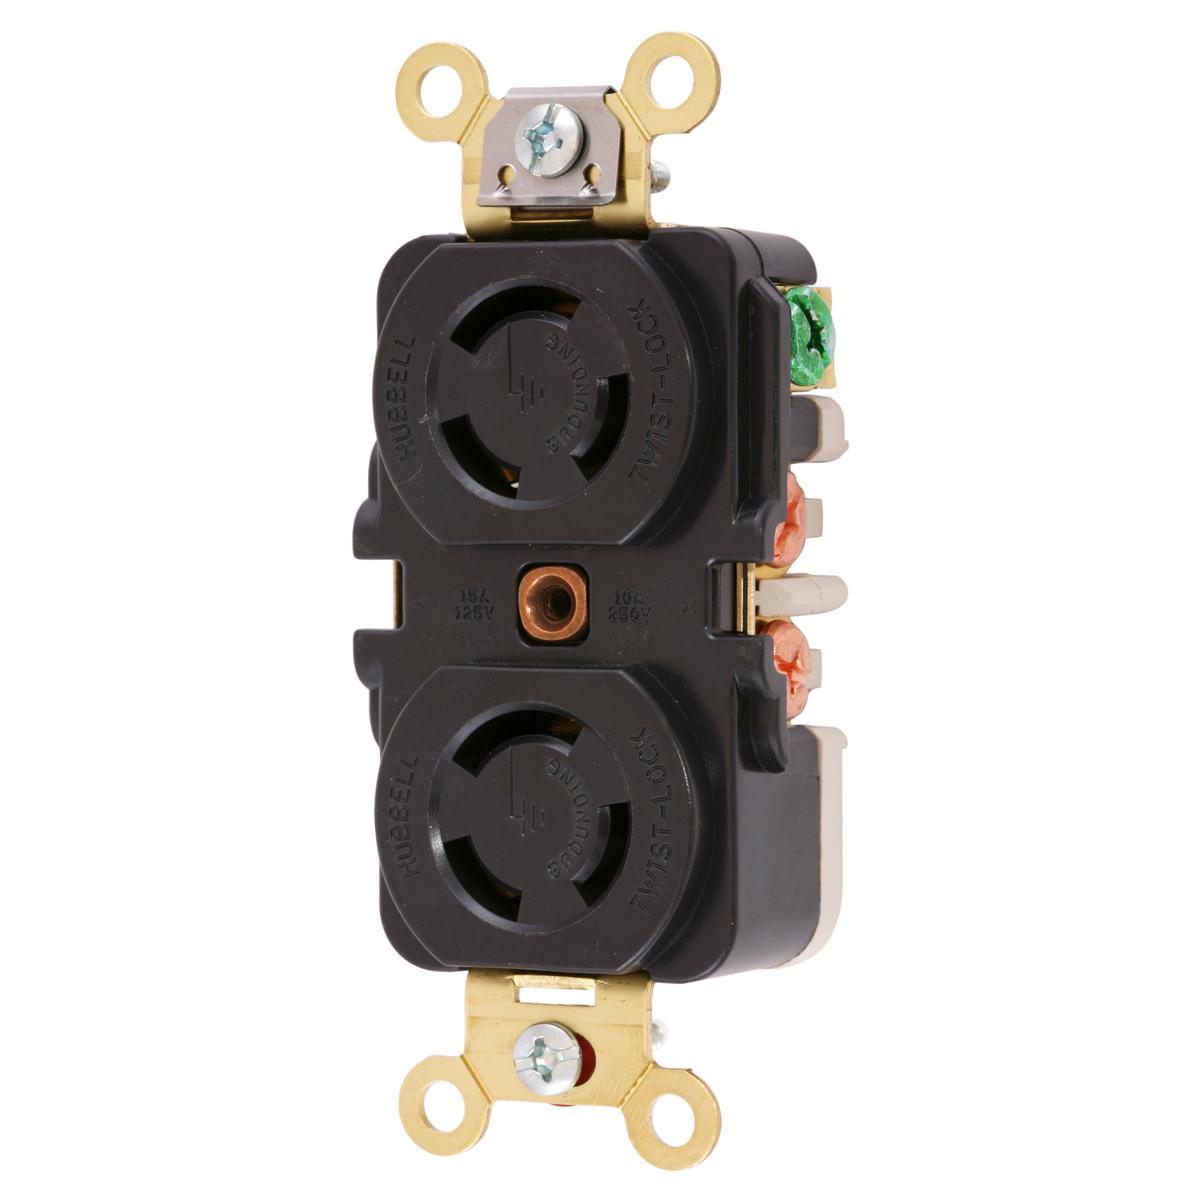 Hubbell HBL7580G 10 Amp 250 VAC 2-Pole 3-Wire Non-NEMA Black Duplex Locking Receptacle